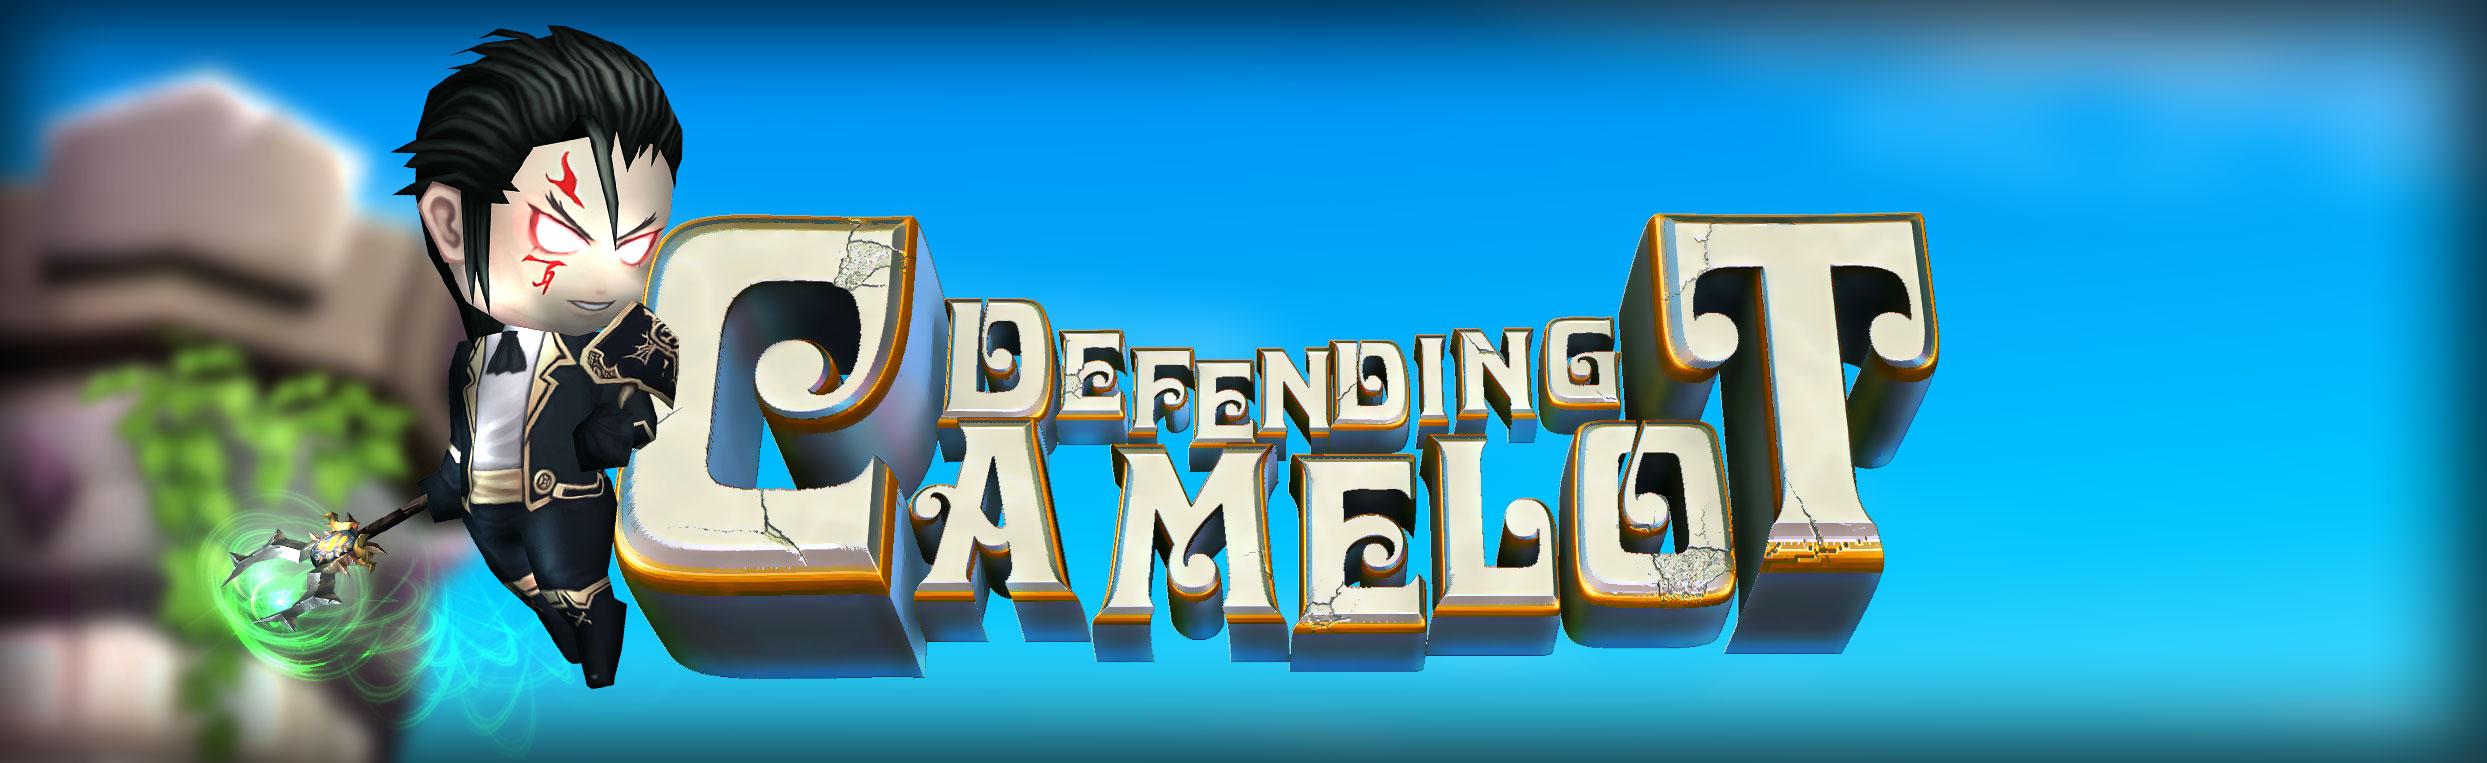 Defending Camelot Demo